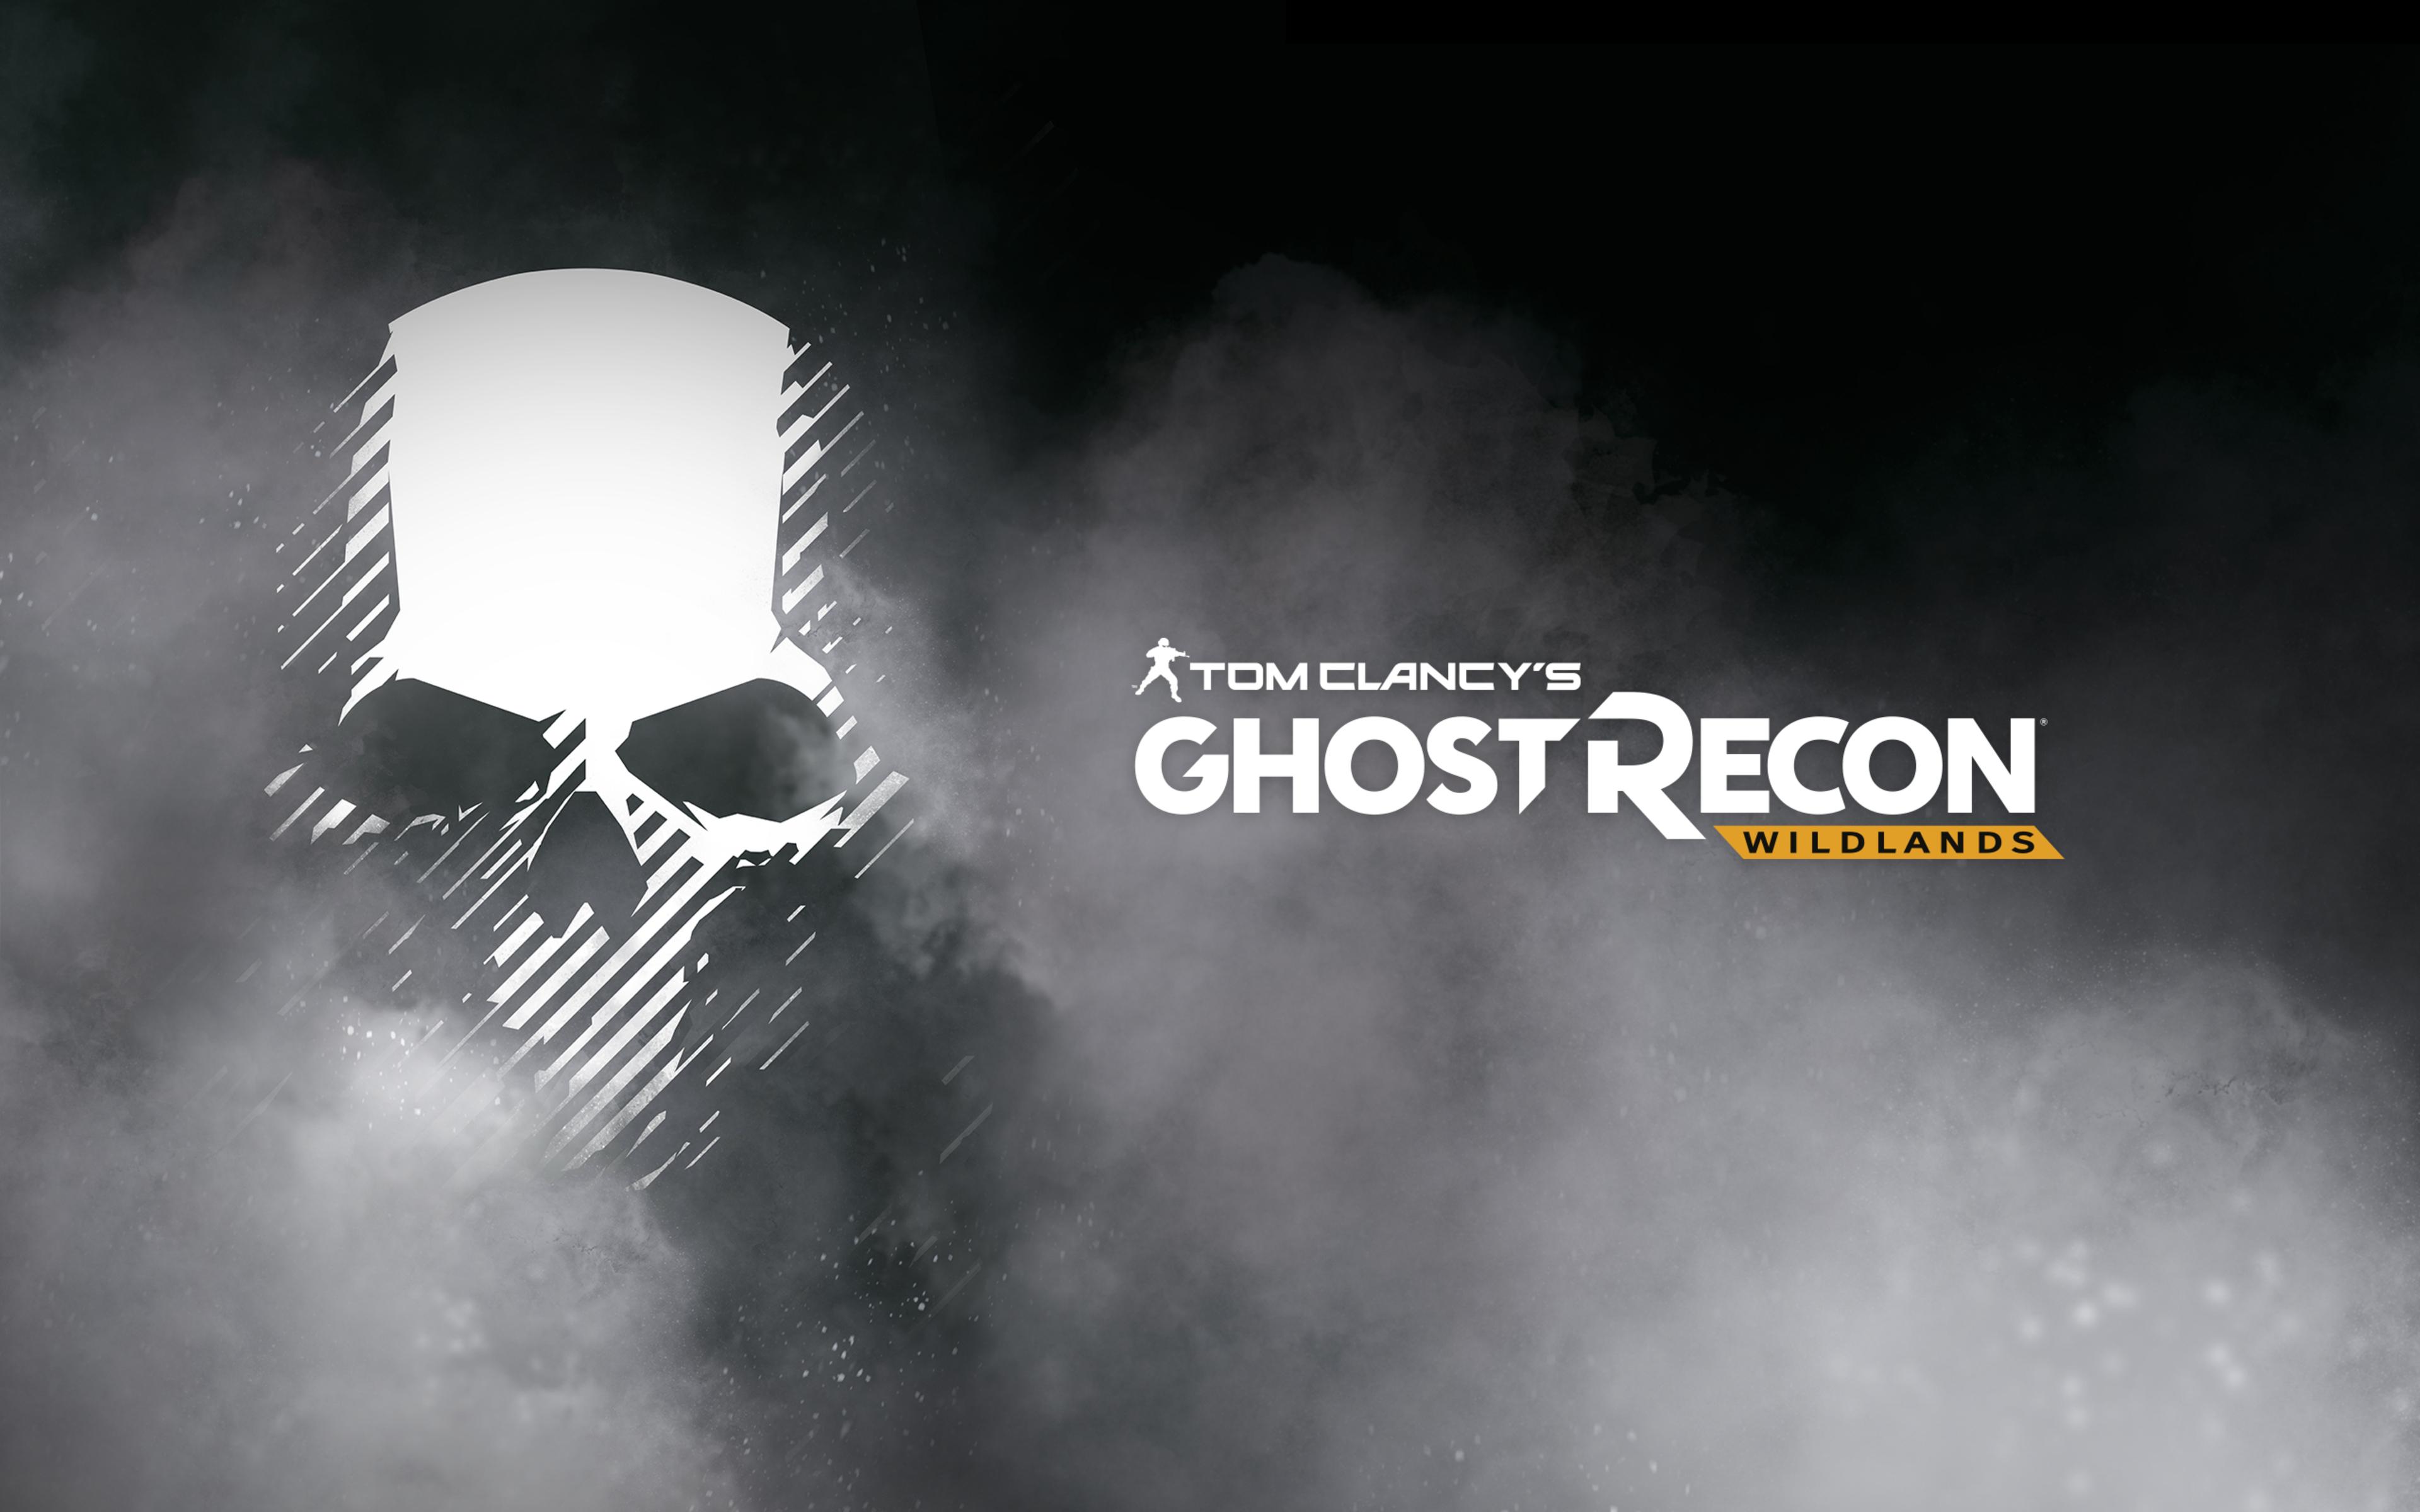 tom-clancys-ghost-recon-wildlands-skull-do.jpg